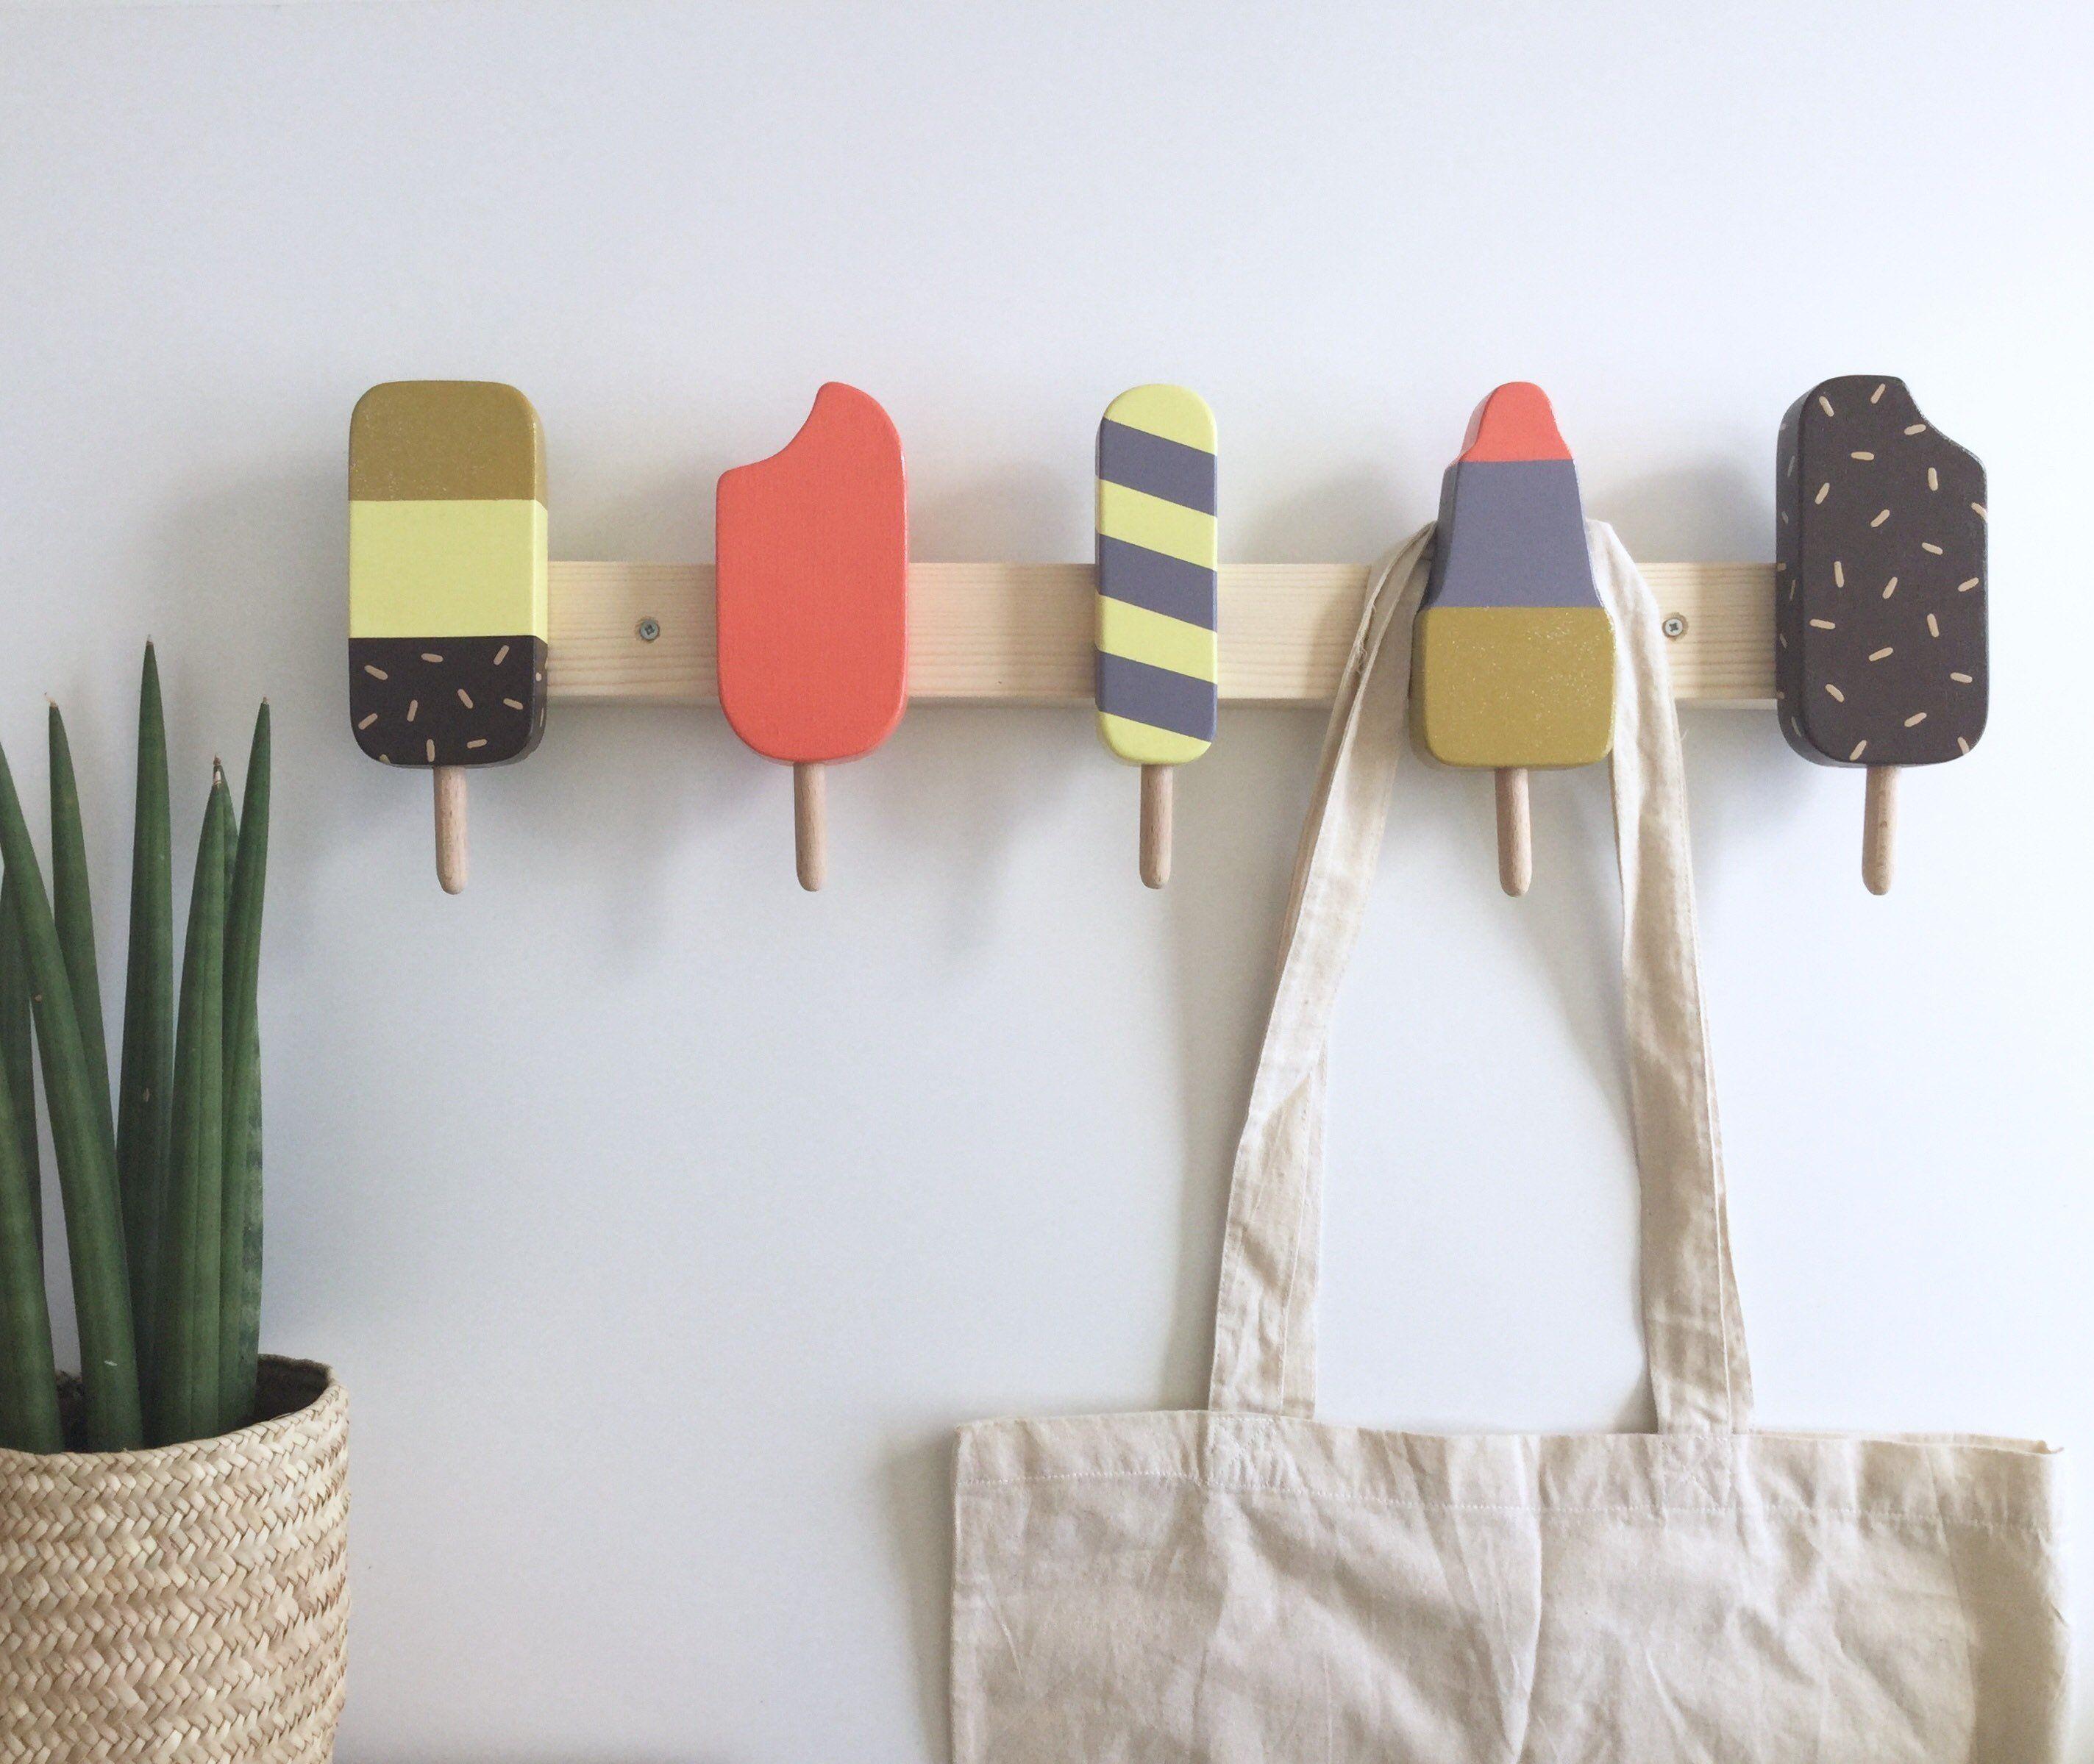 Garderobe Eis Kind Garderobe Tur Mantel Holz Holz Hutte